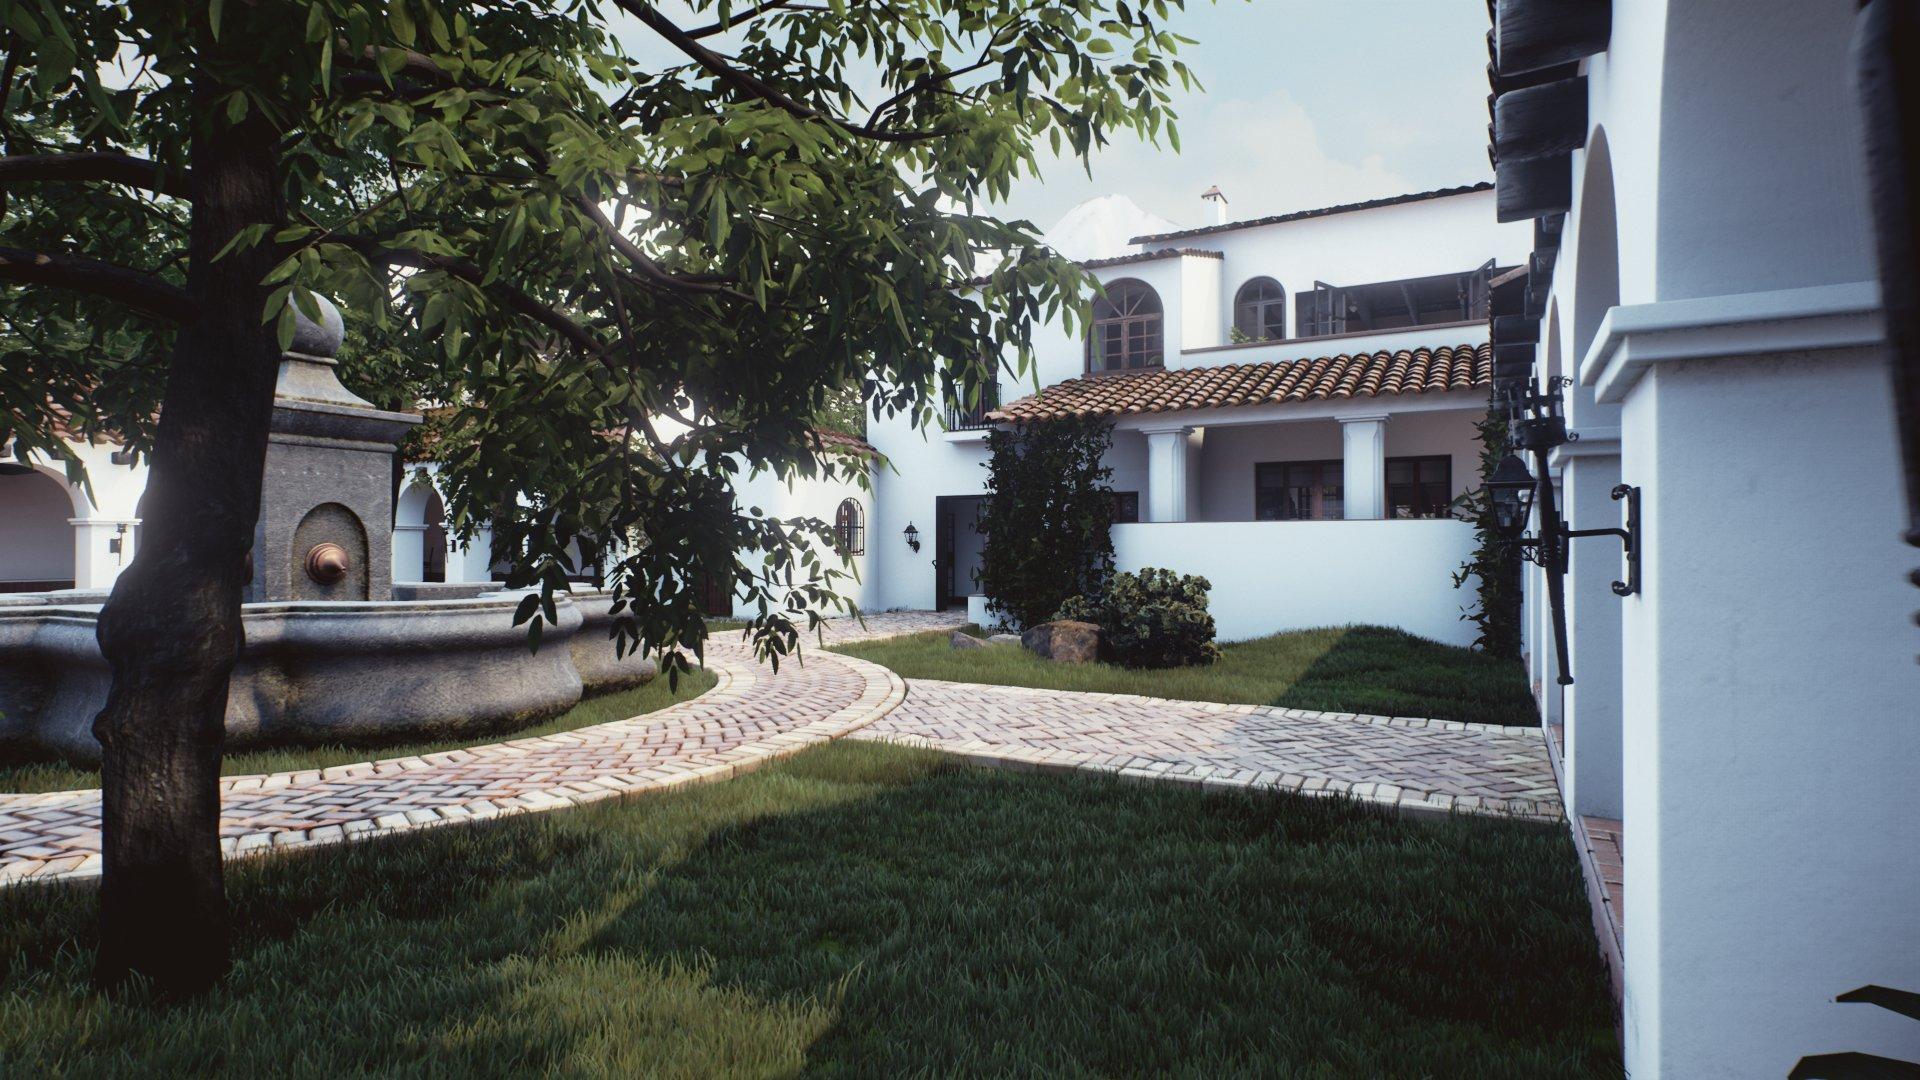 hacienda_v5_0939_evermotion_962.jpg